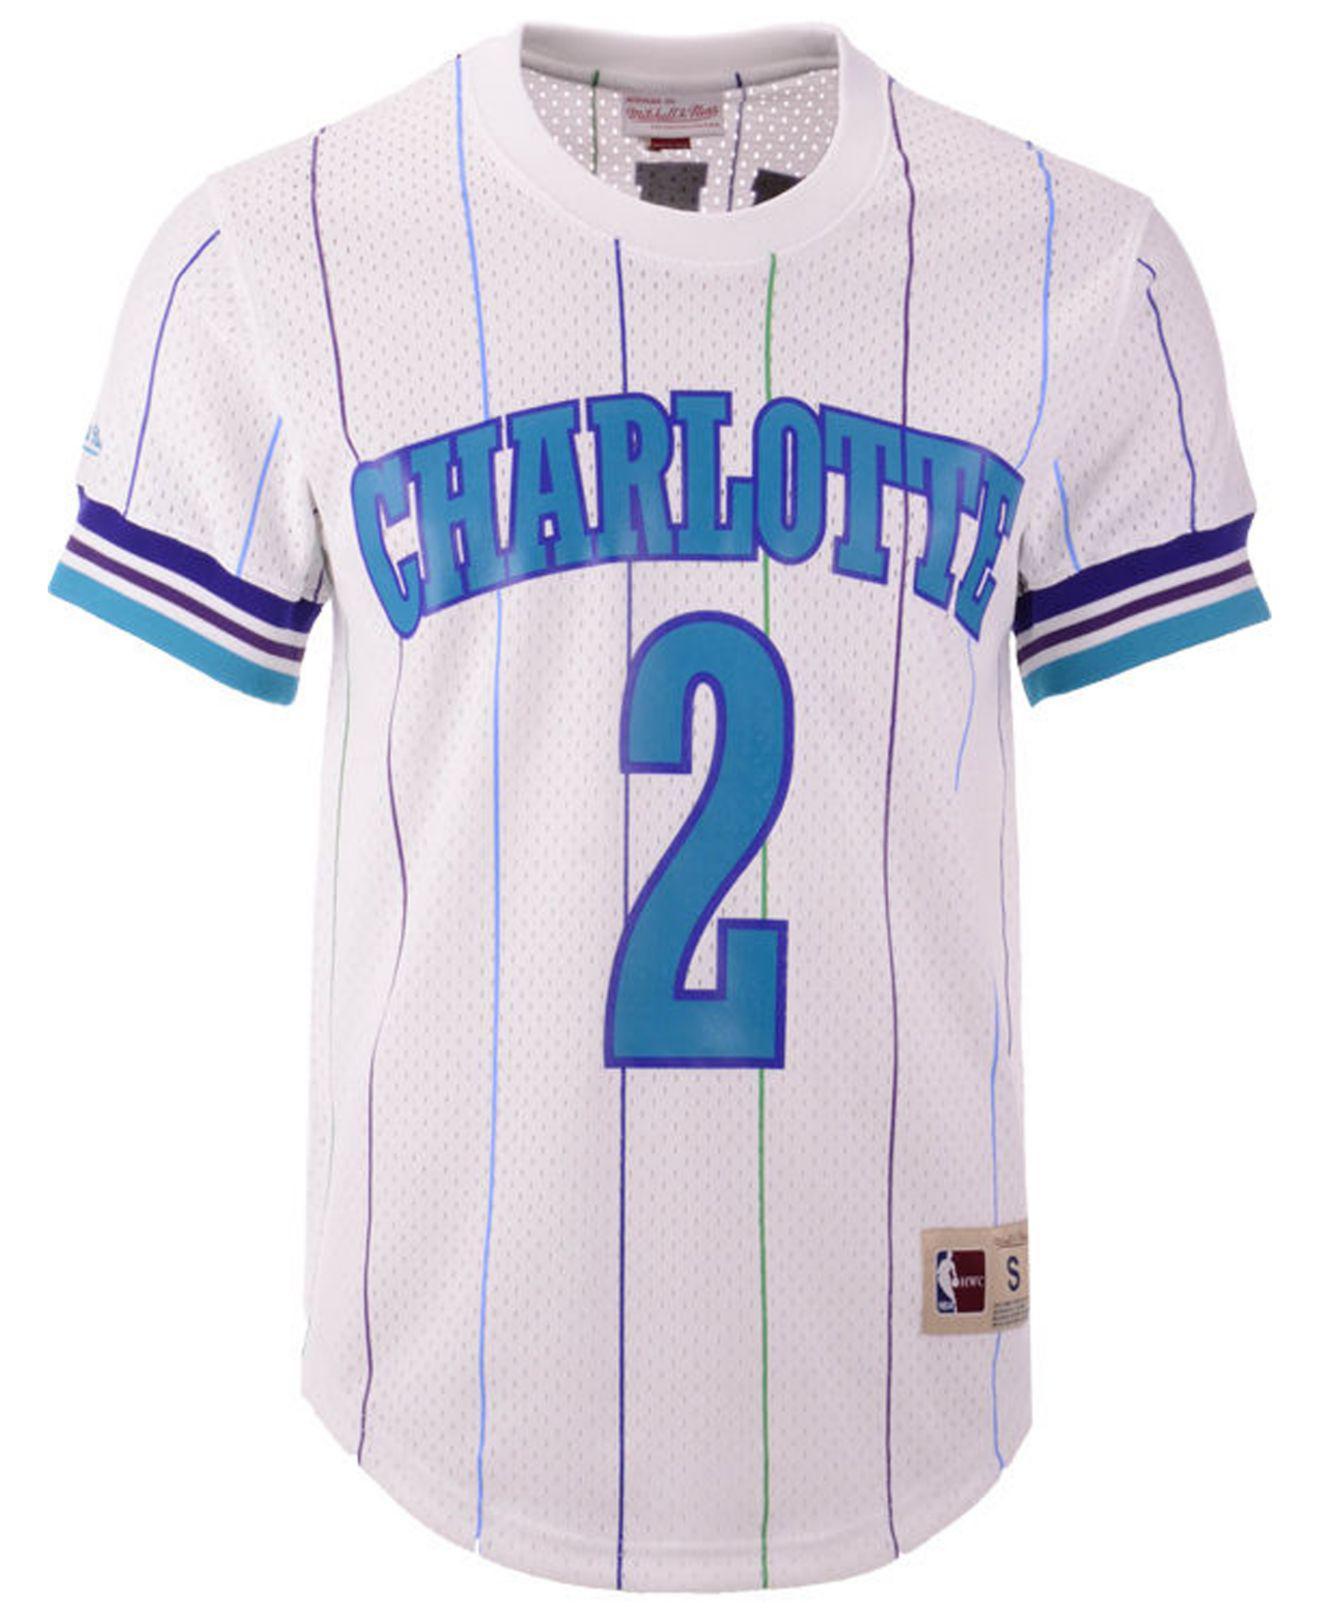 official photos af787 646df Men's White Larry Johnson Charlotte Hornets Name And Number Mesh Crewneck  Jersey